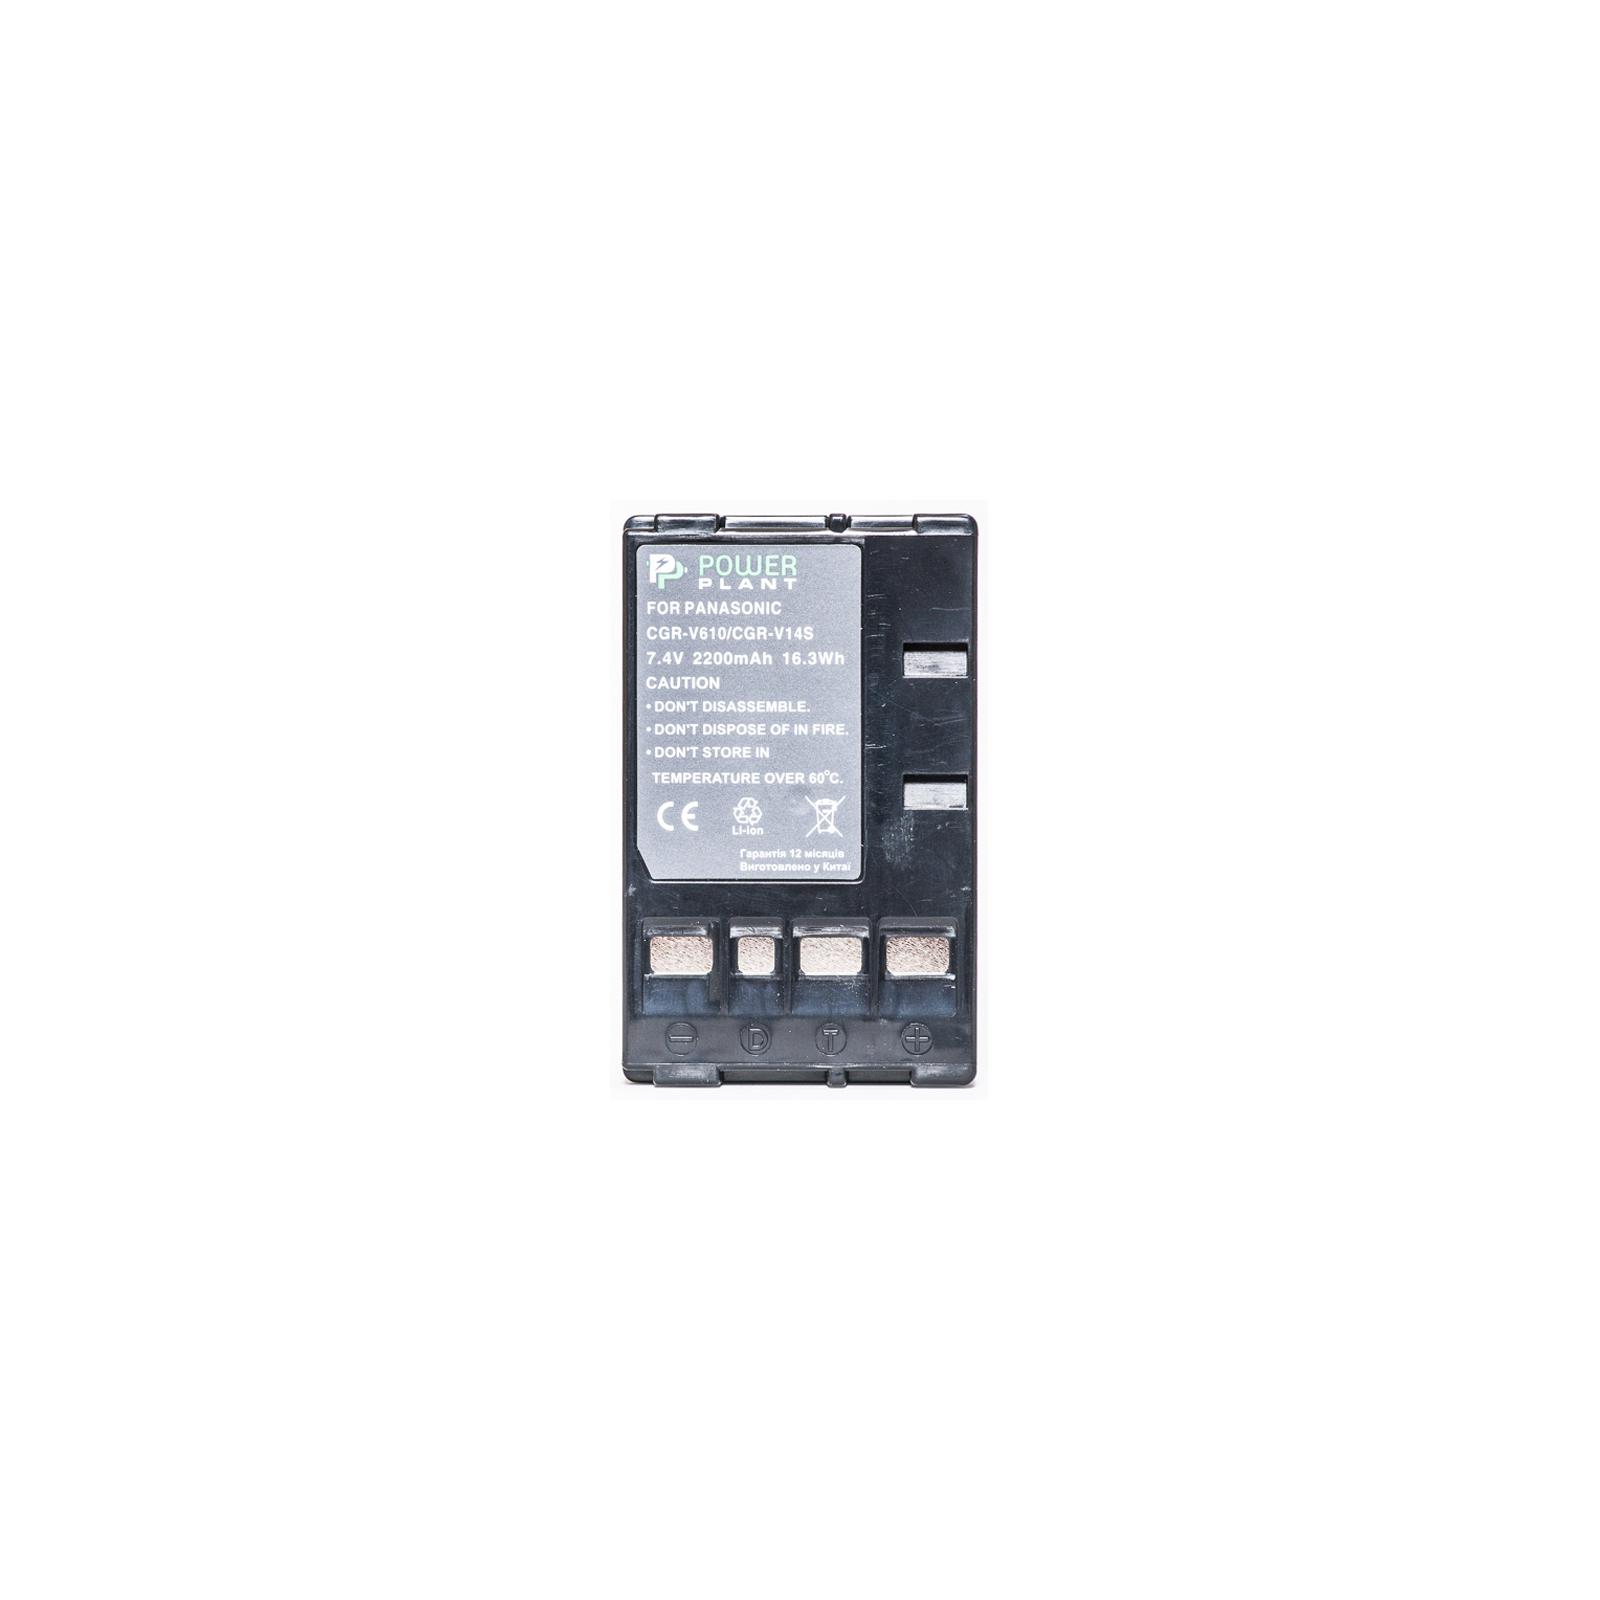 Аккумулятор к фото/видео PowerPlant Panasonic V610, V14 (DV00DV1095) изображение 2